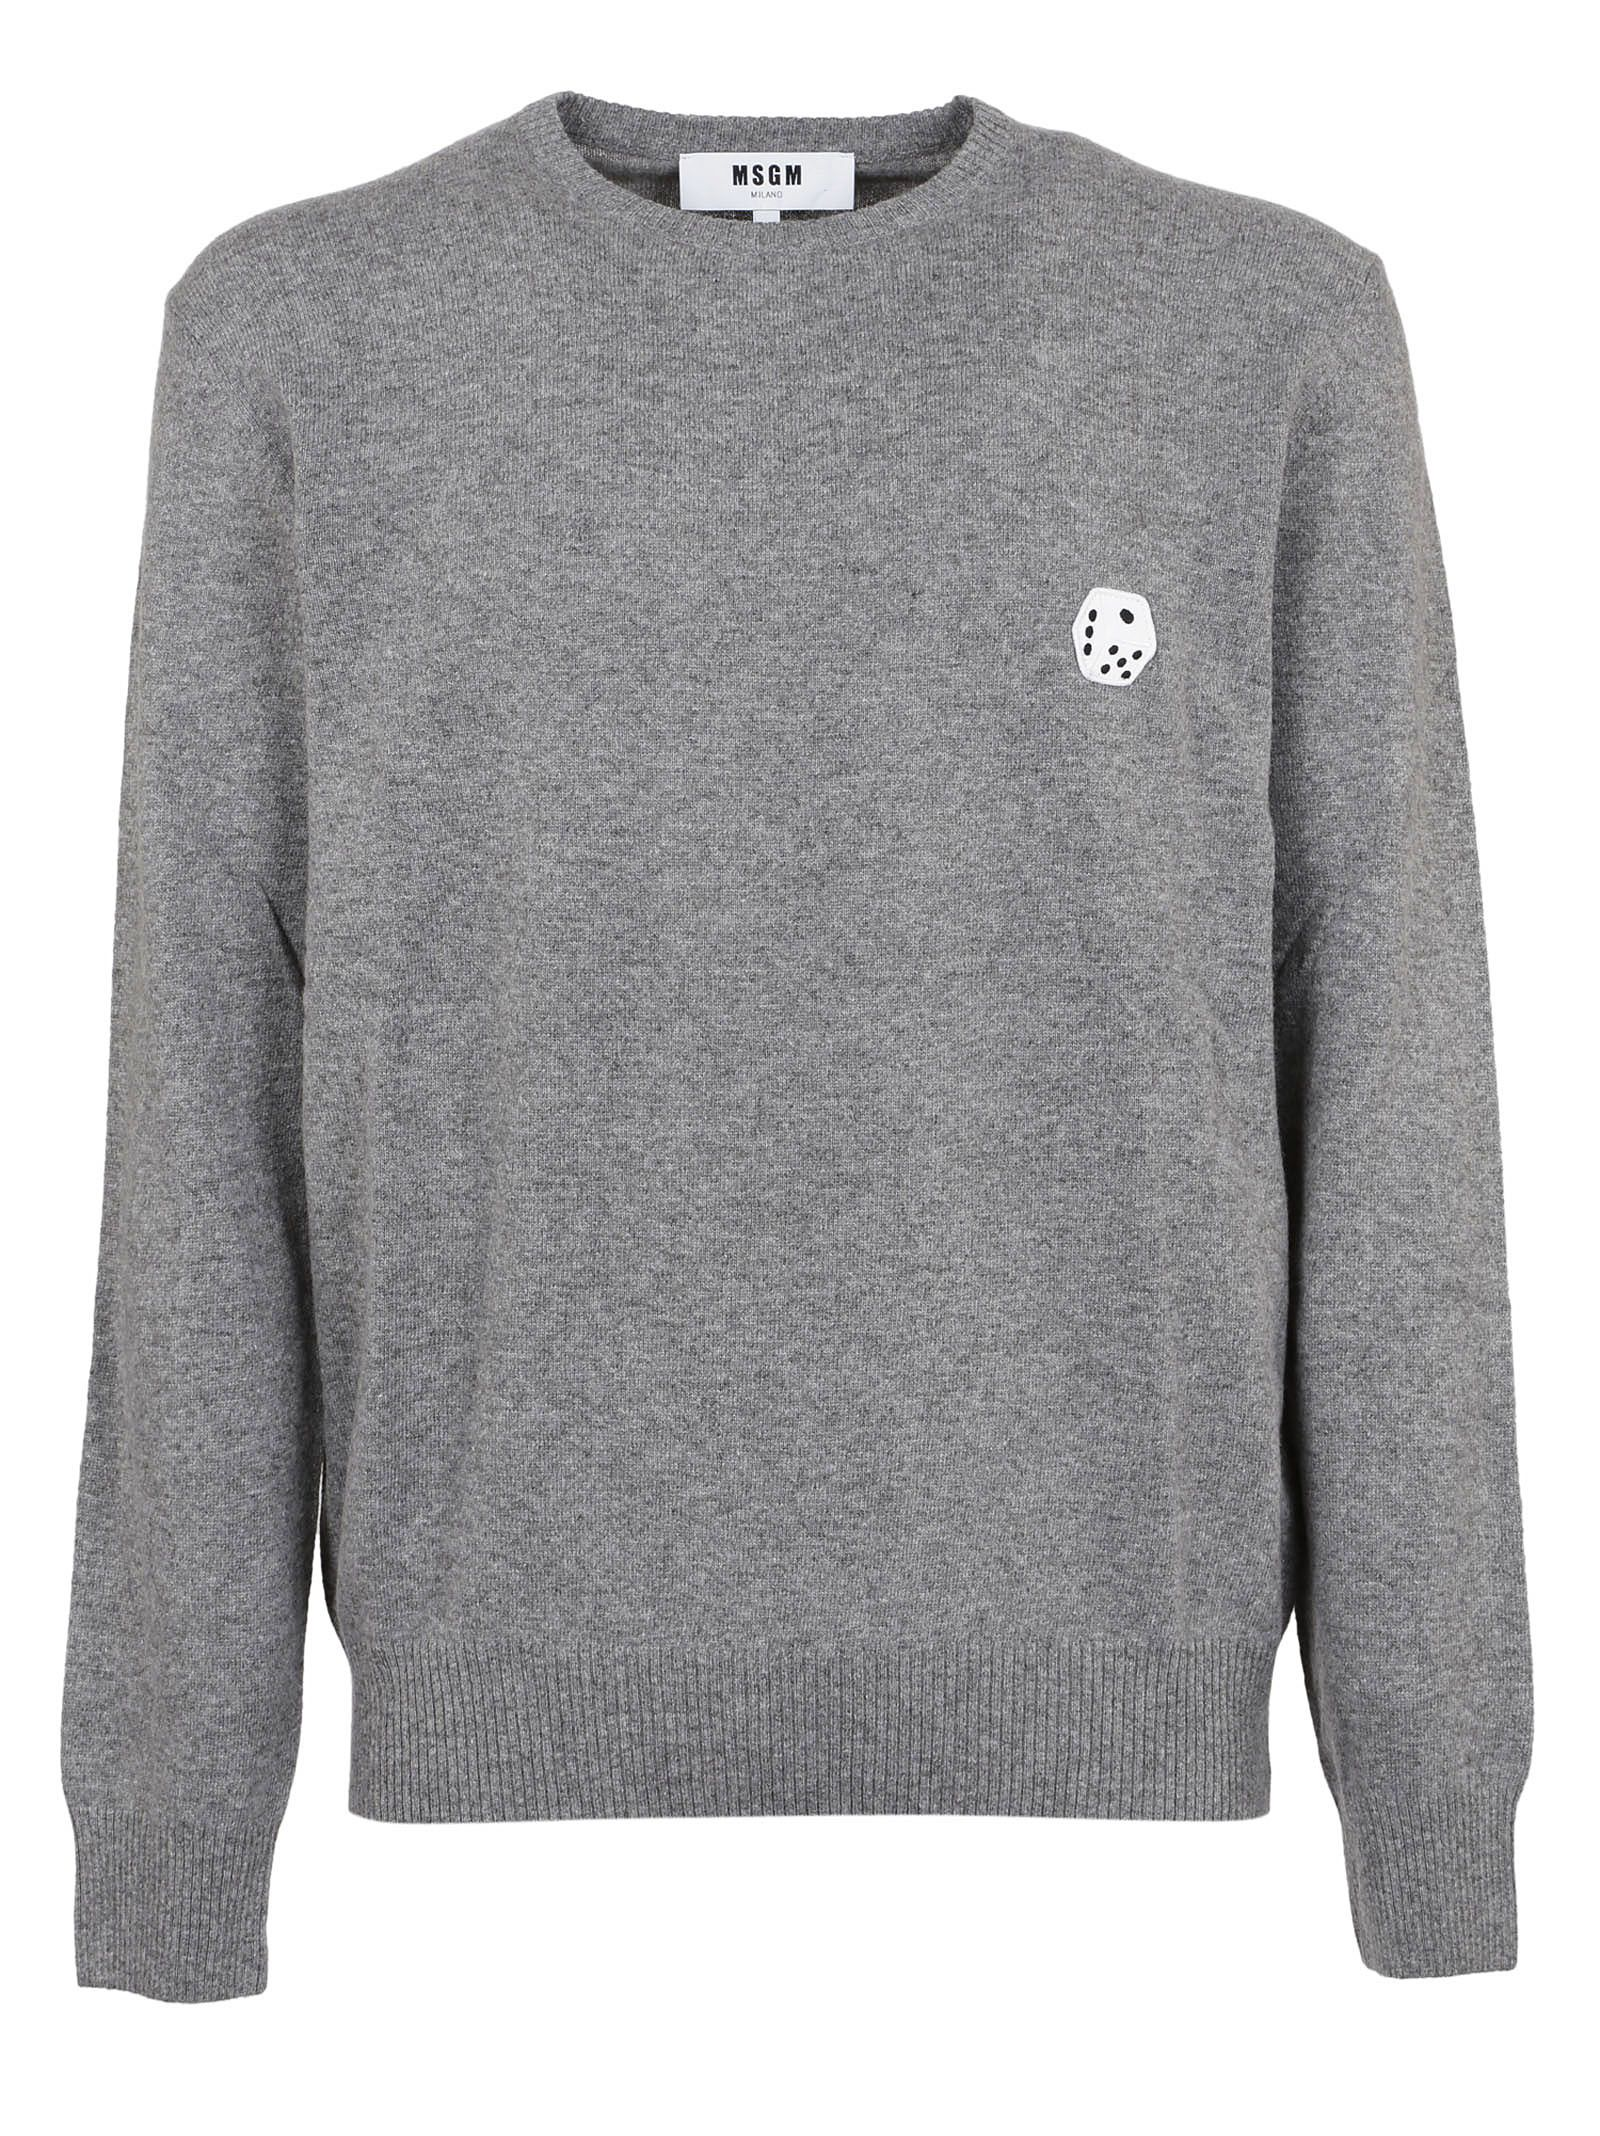 Msgm Dice Sweater